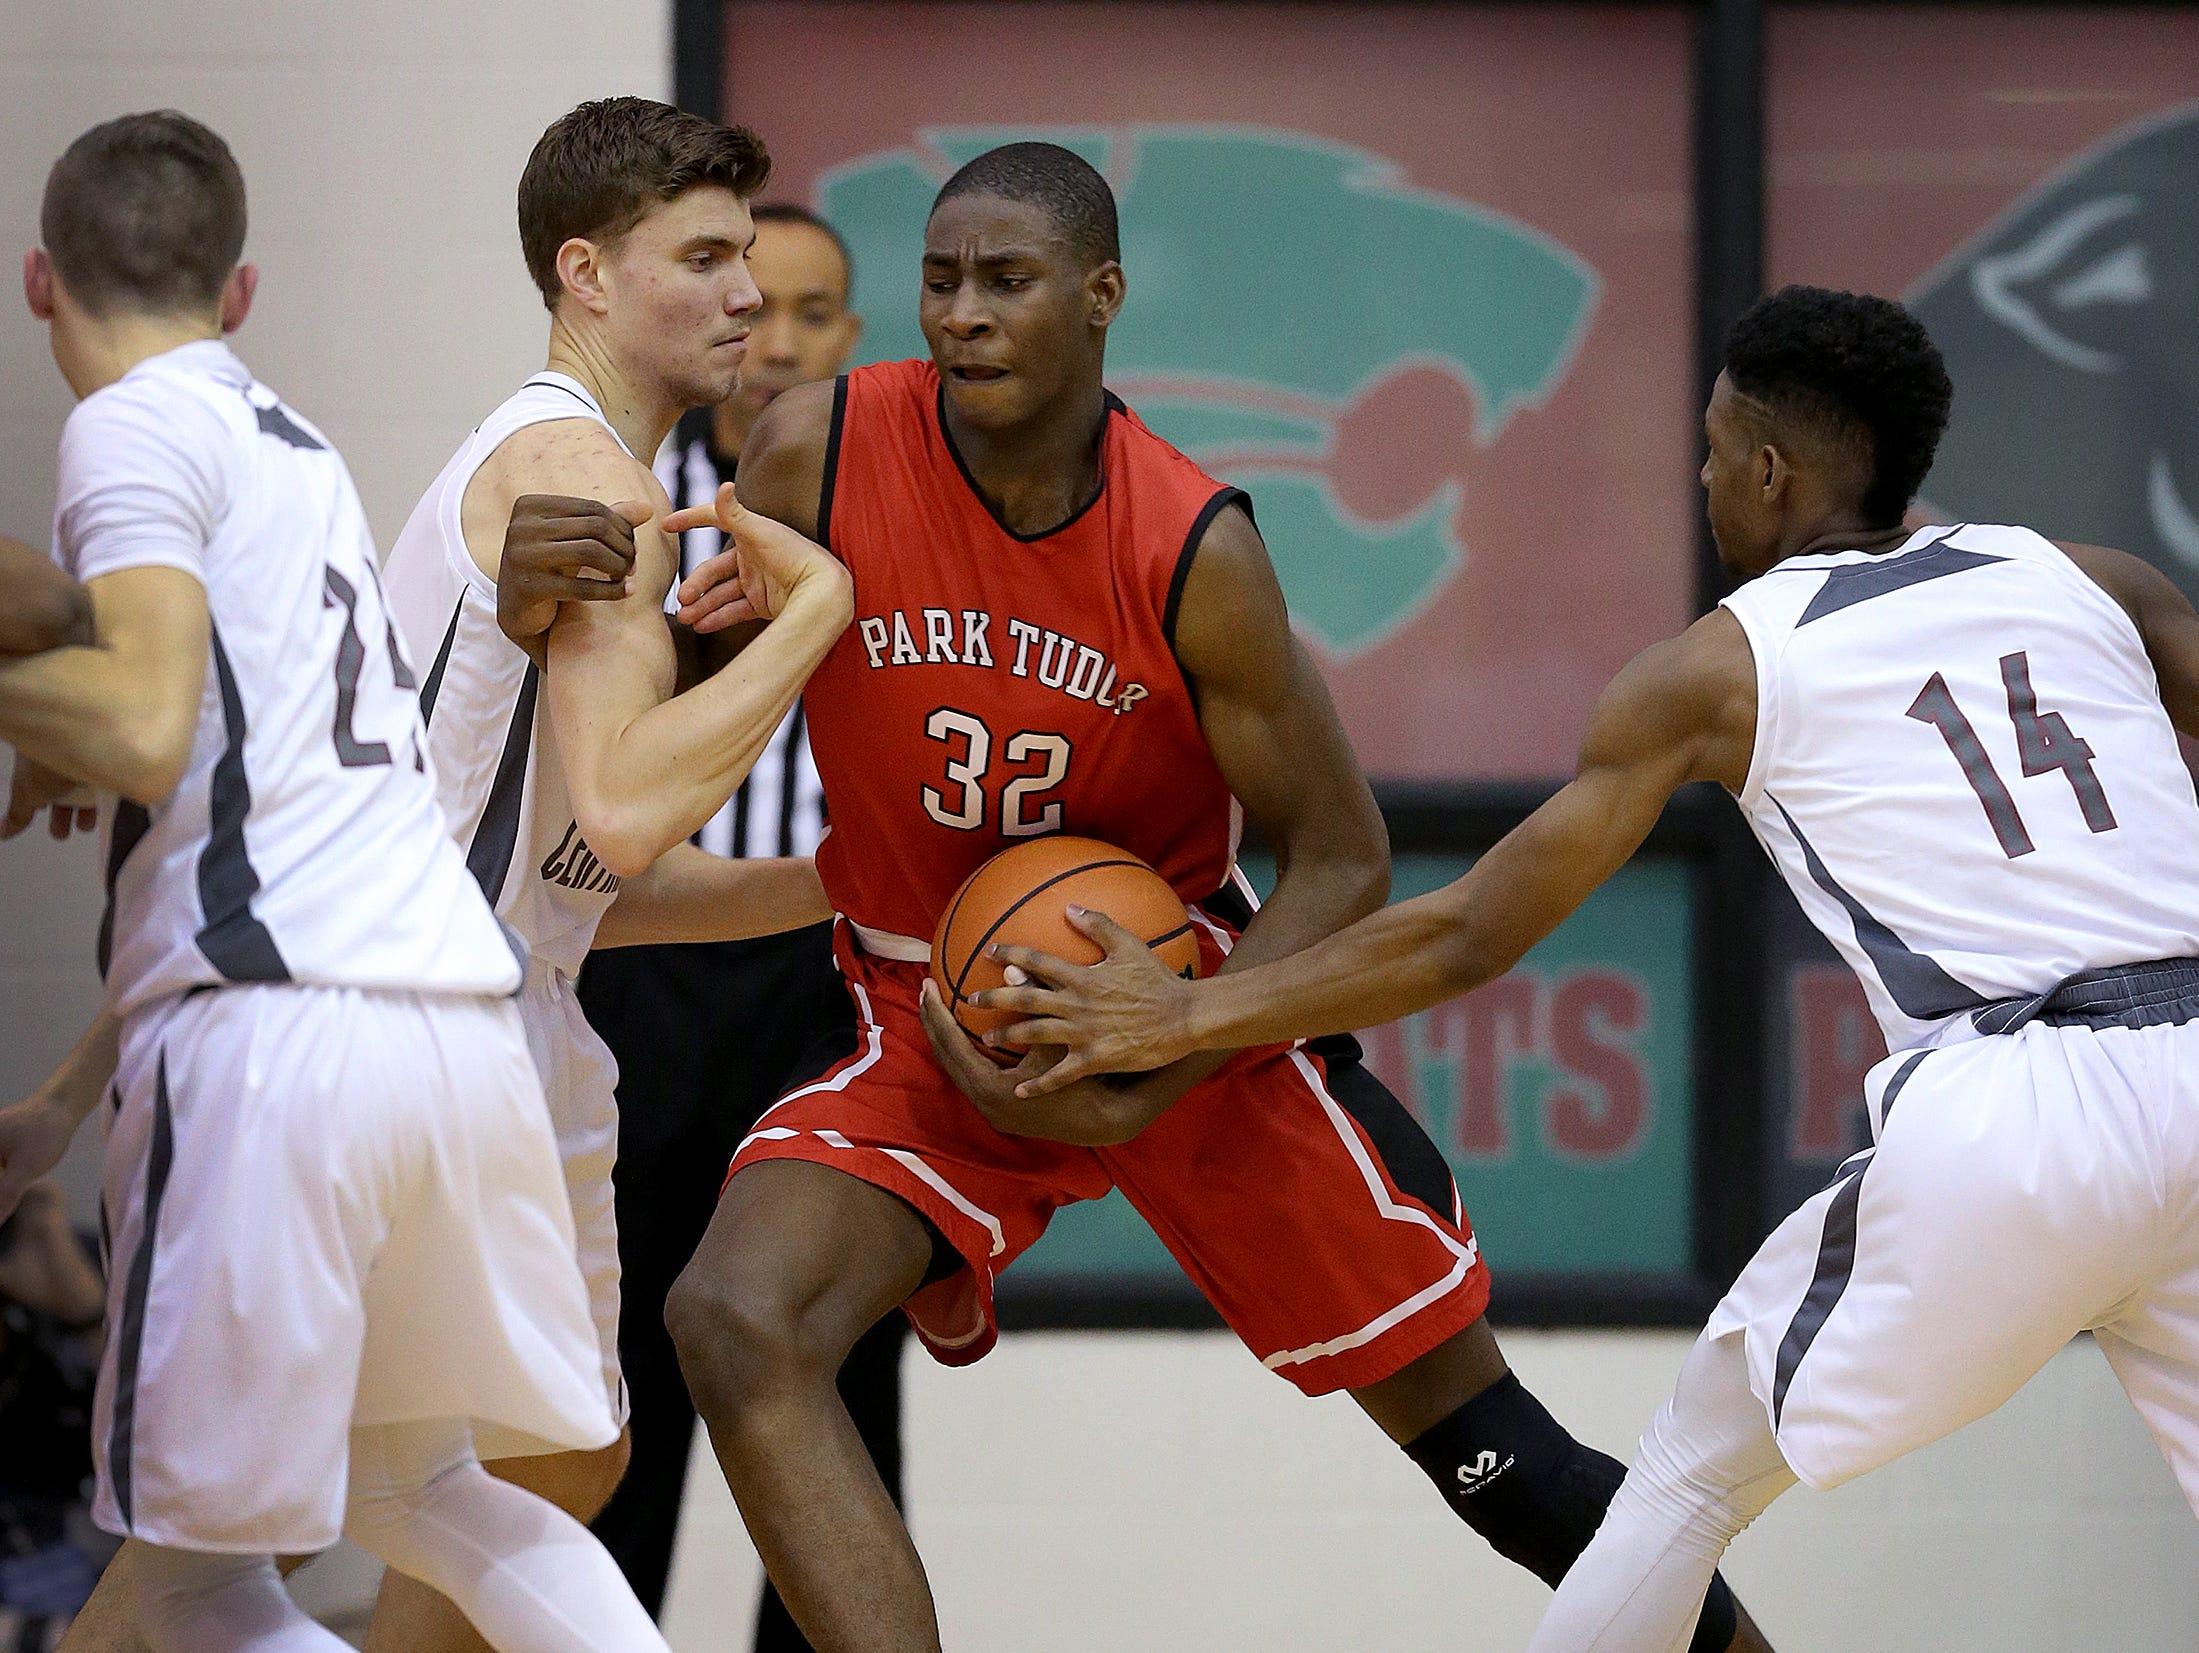 A top area player his first three seasons at Park Tudor, Jaren Jackson Jr. will finish his high school career at La Lumiere.